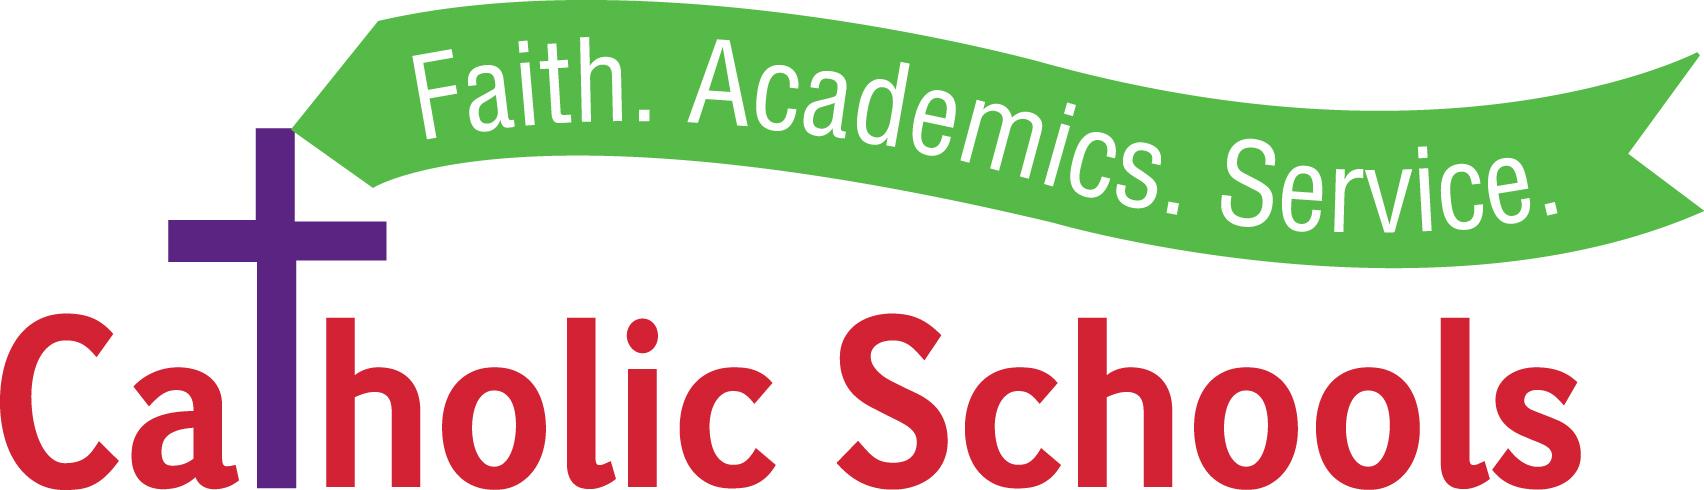 Haven clipart catholic school Check Education